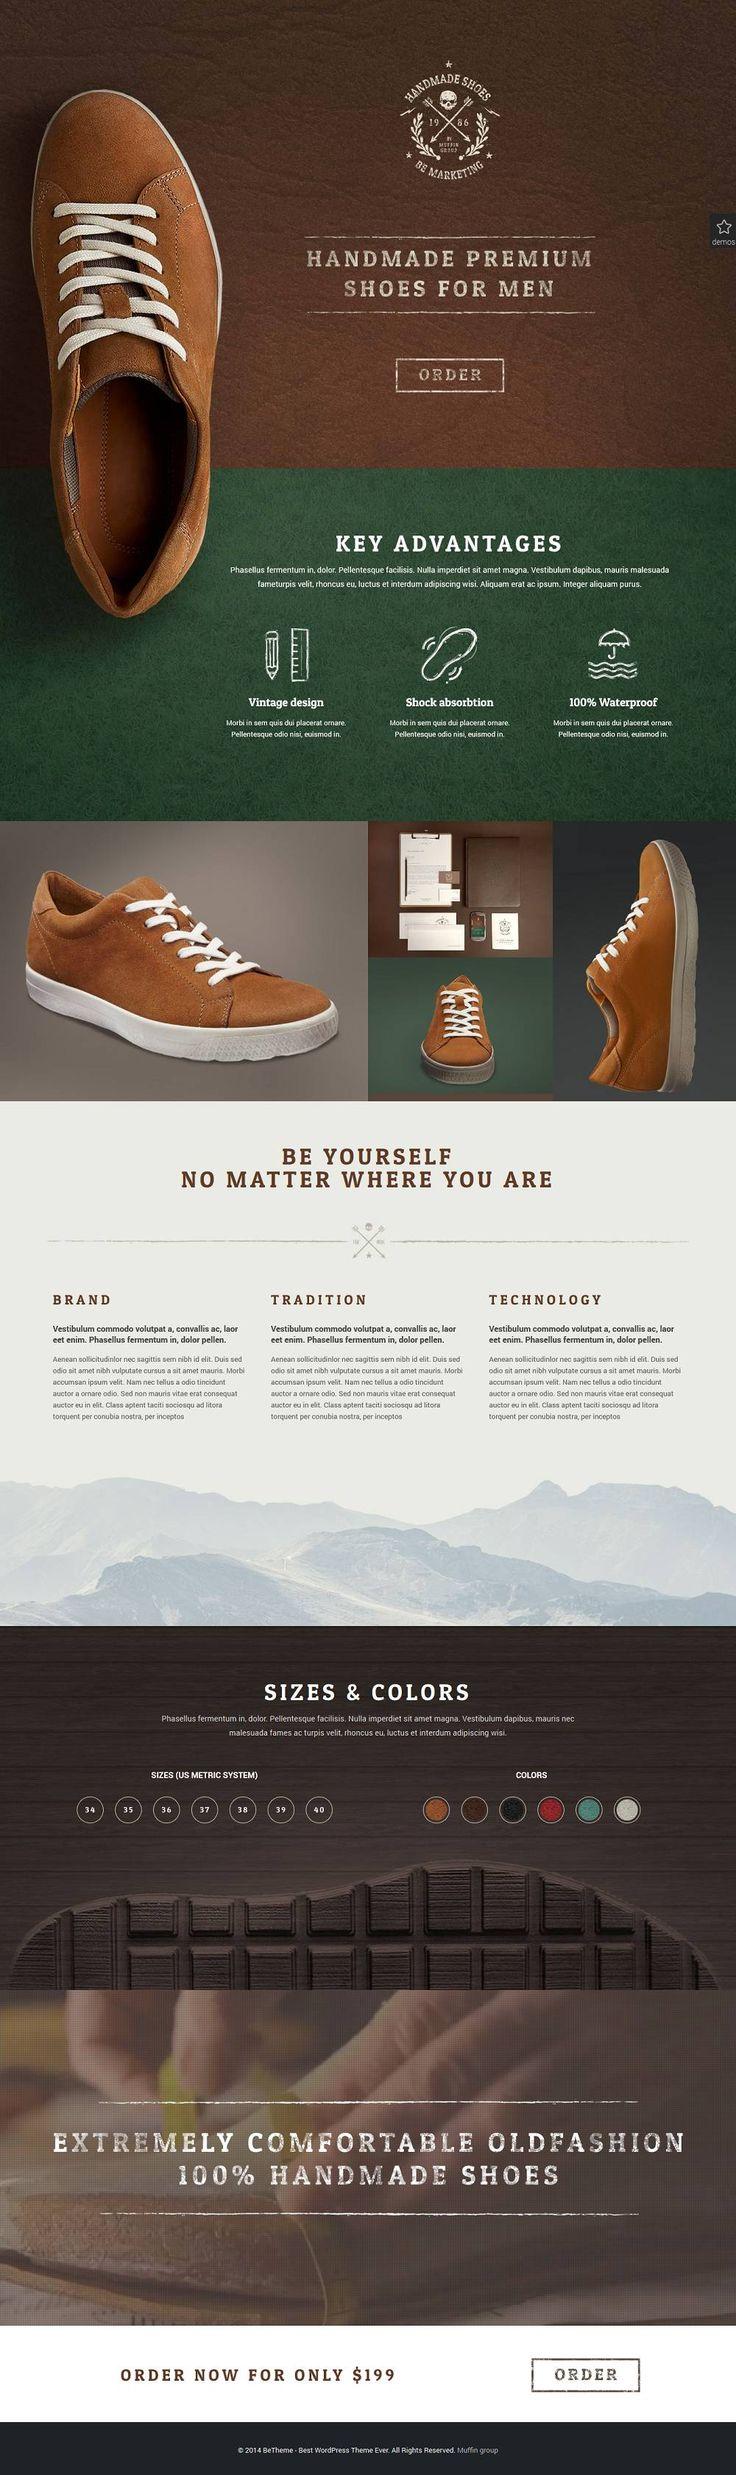 BeTheme – Best WordPress Theme Ever - http://www.webcreate.me/the-most-creative-wordpress-themes/